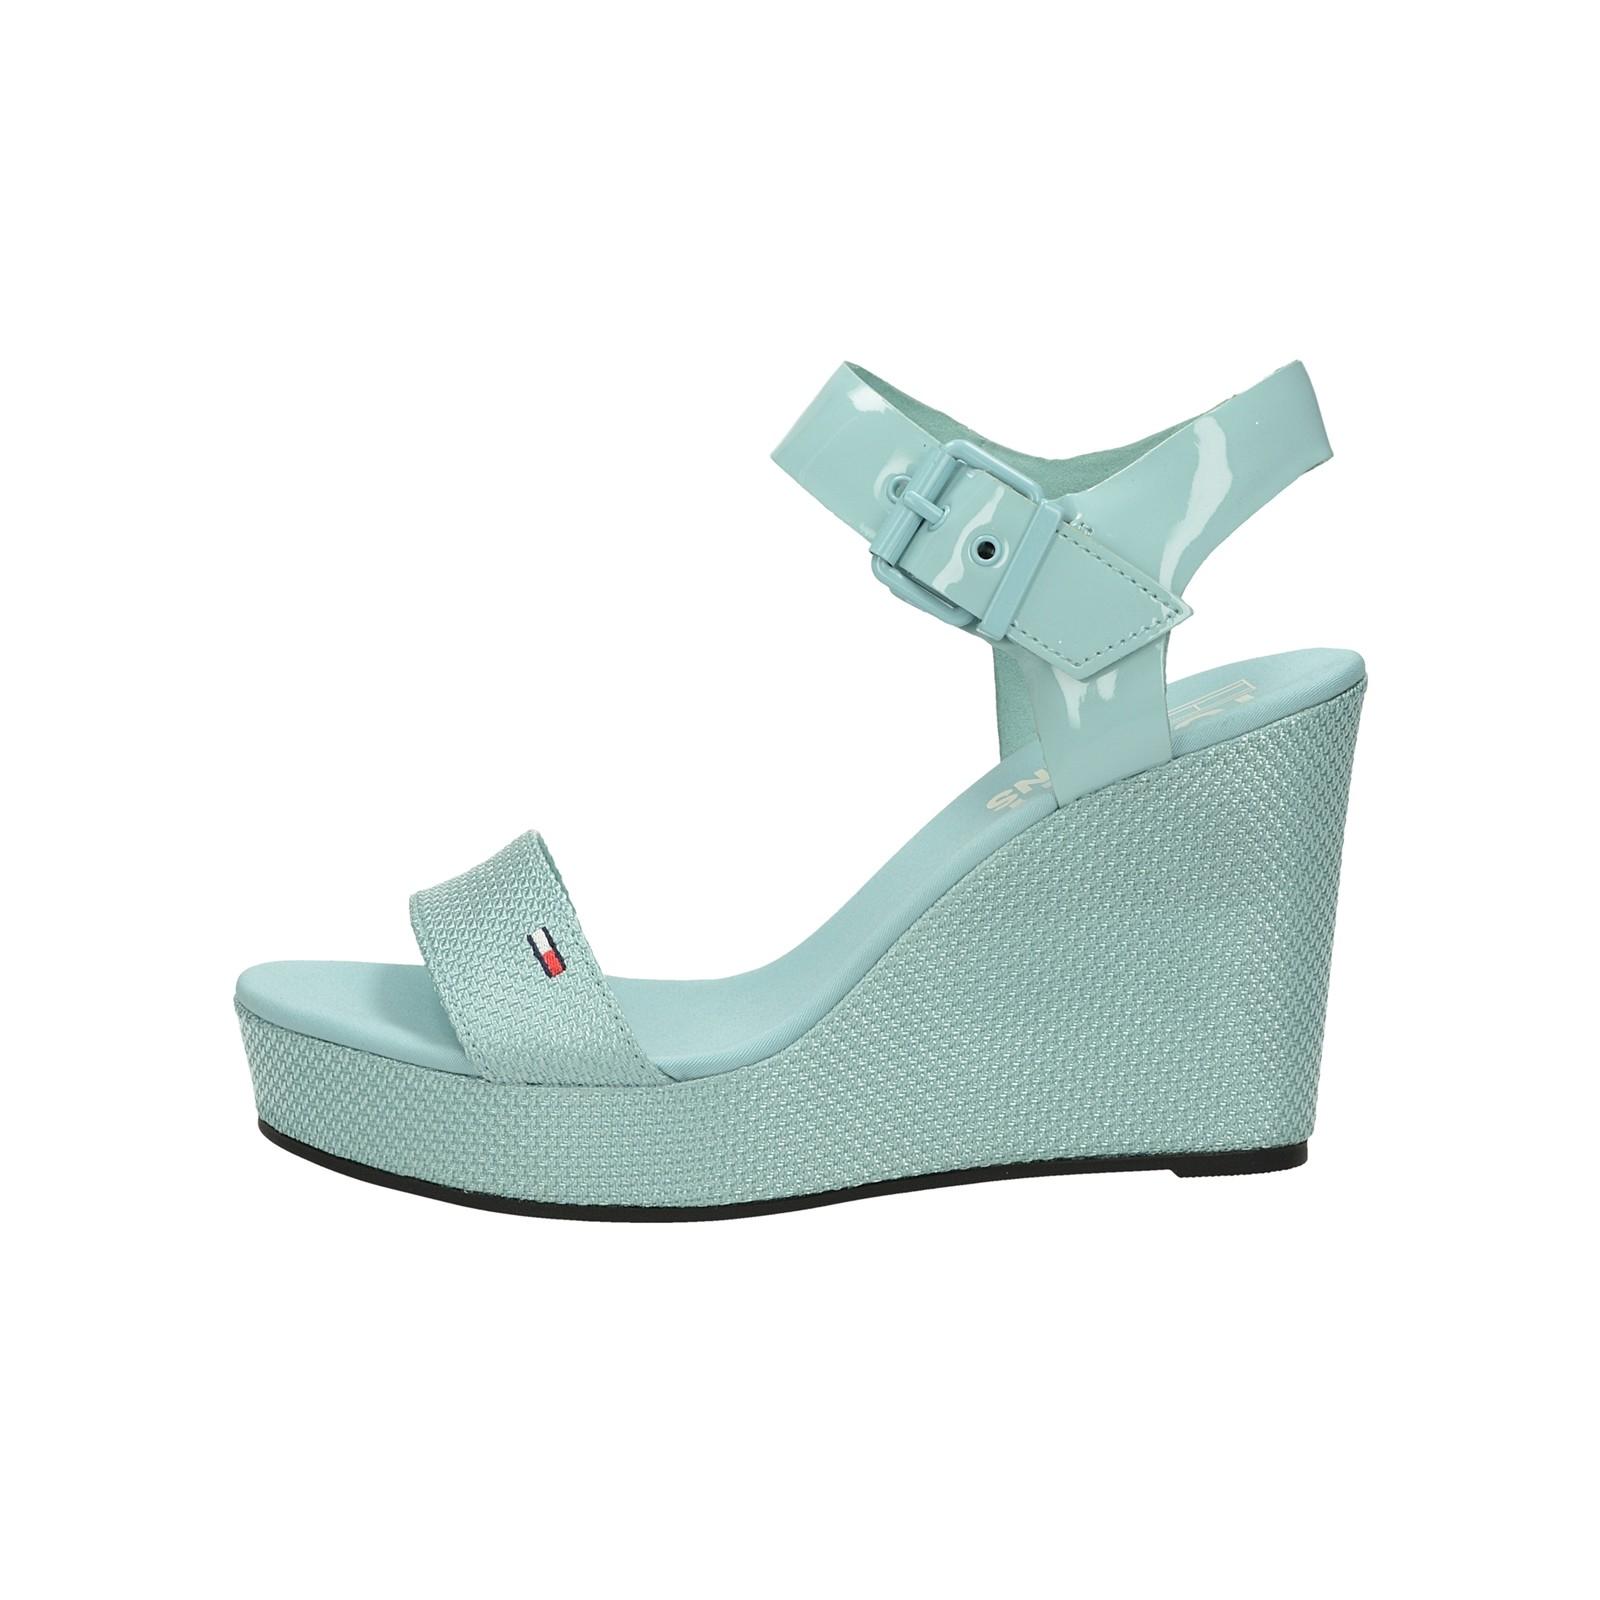 e6c6d03882 ... Tommy Hilfiger dámske štýlové sandále na klinovej podrážke - slabomodré  ...